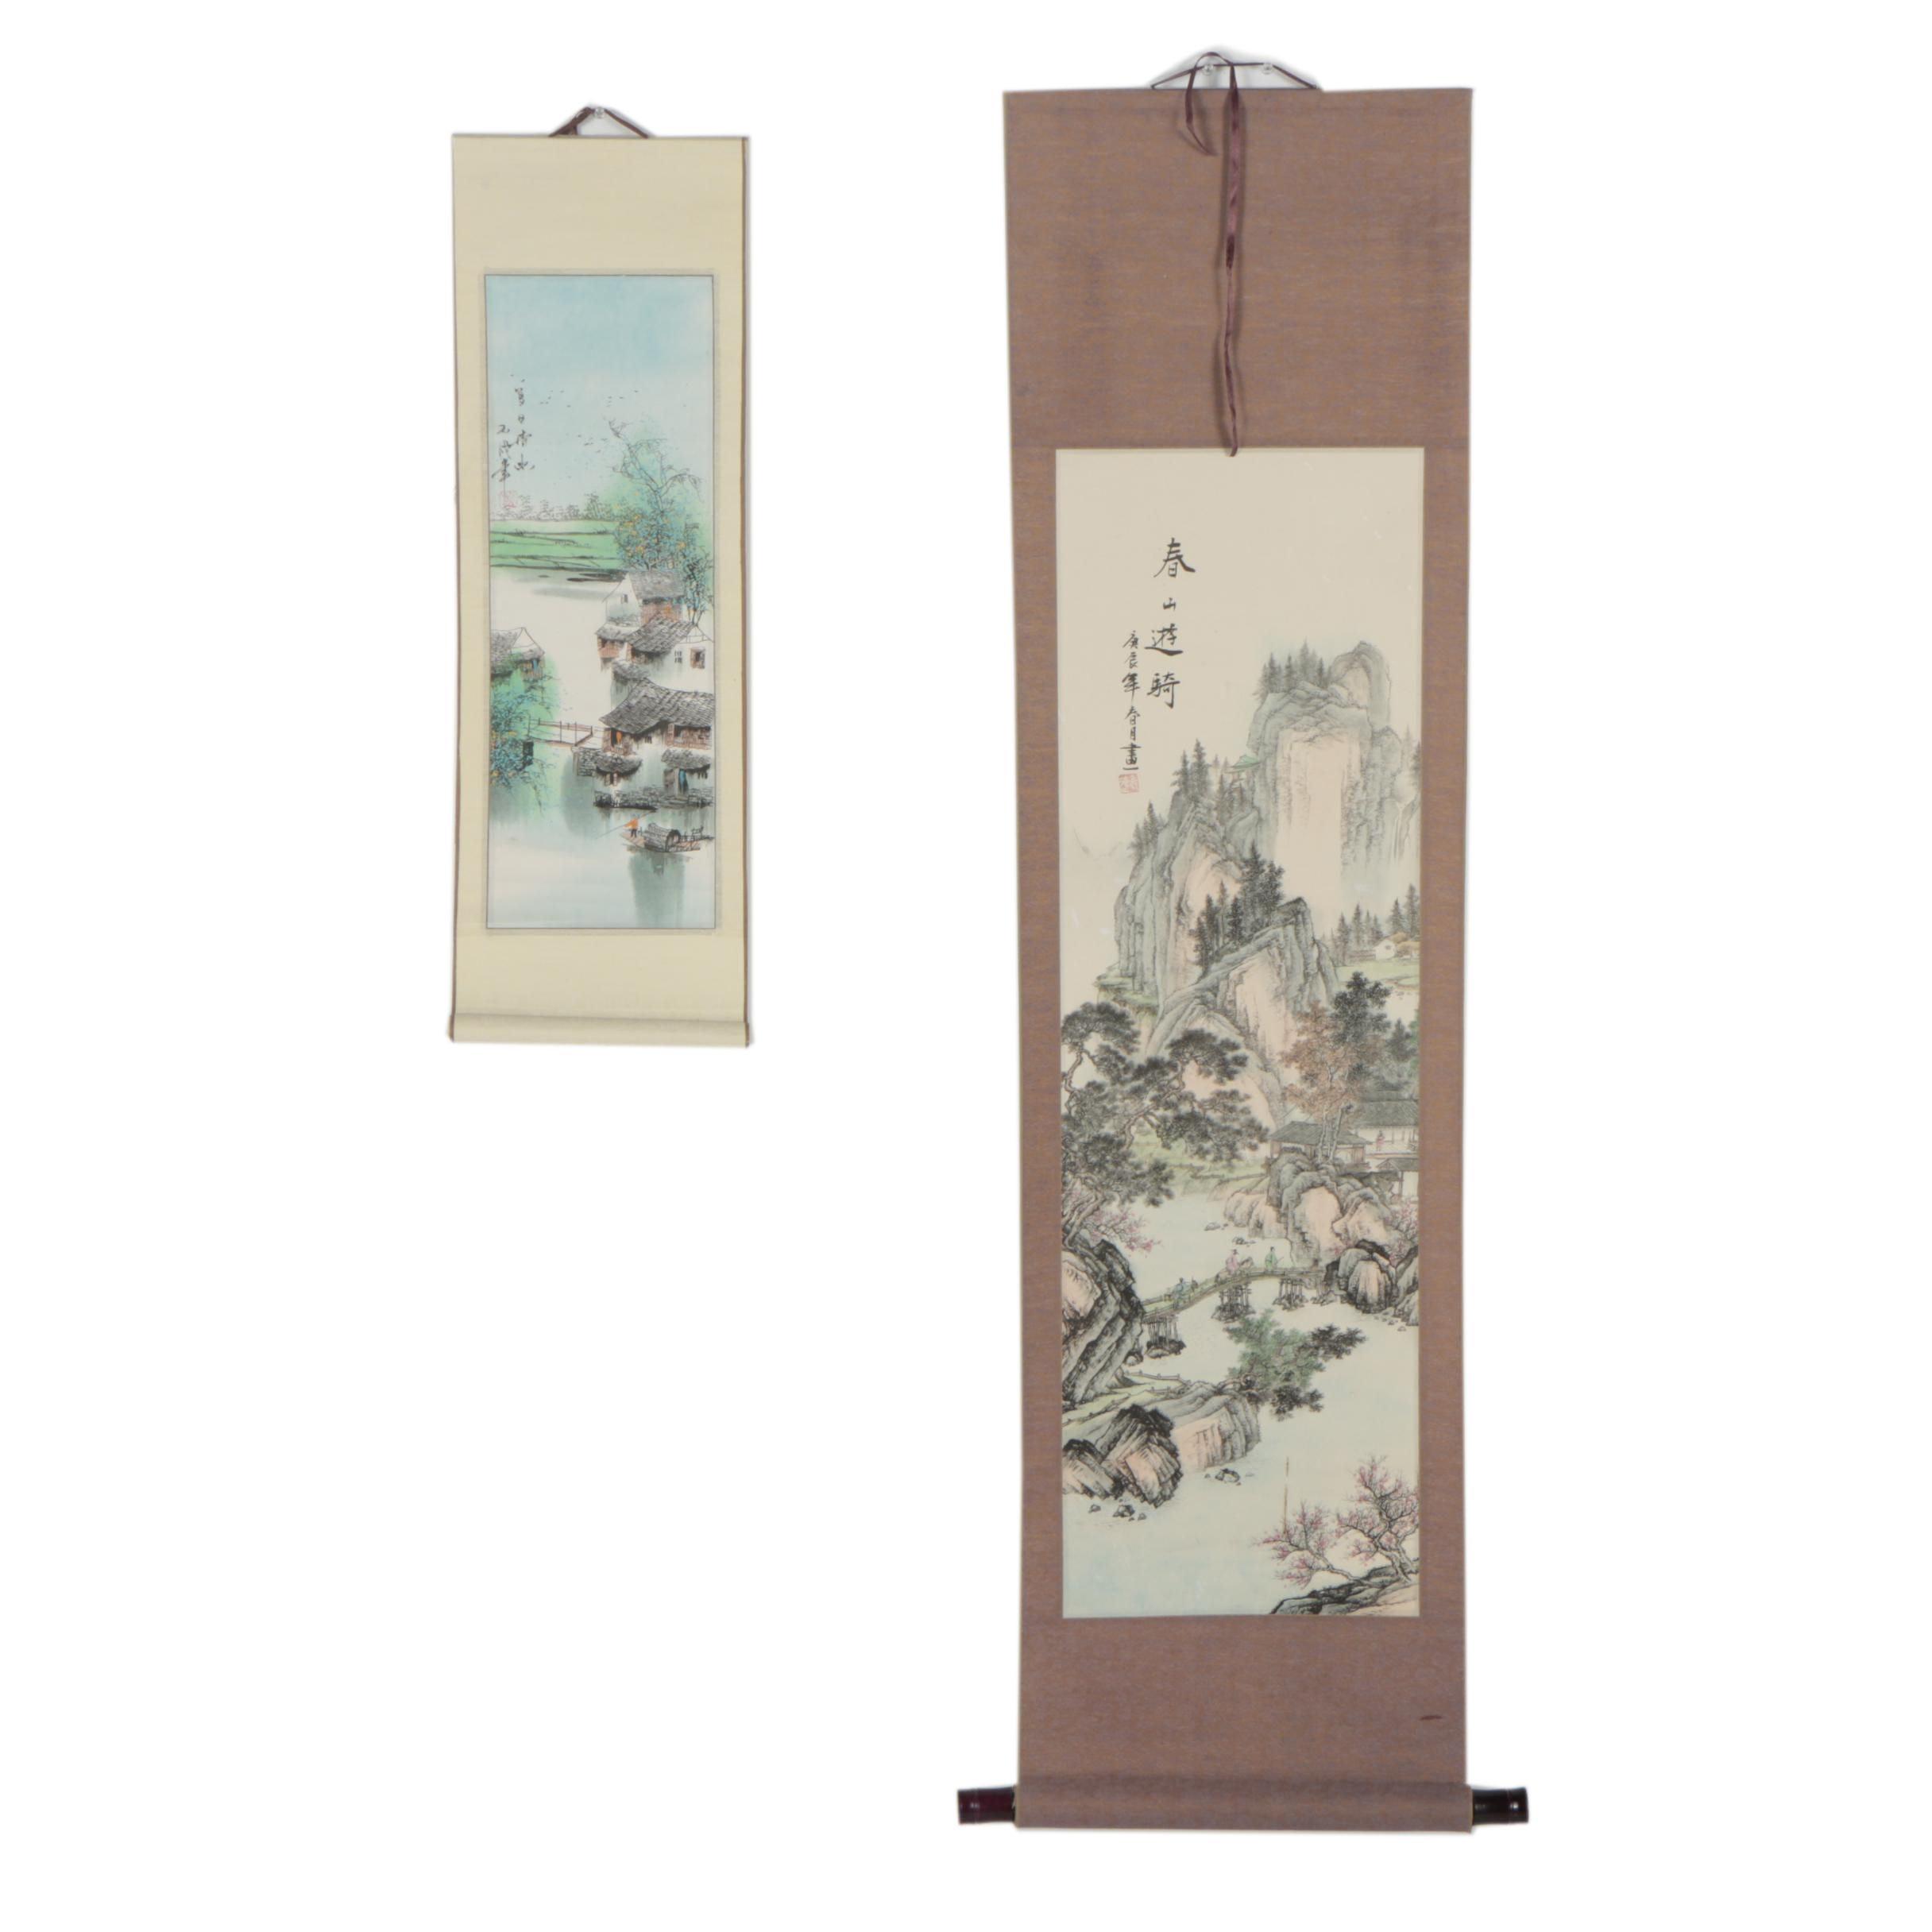 Chinese Hanging Scroll Photomechanical Prints